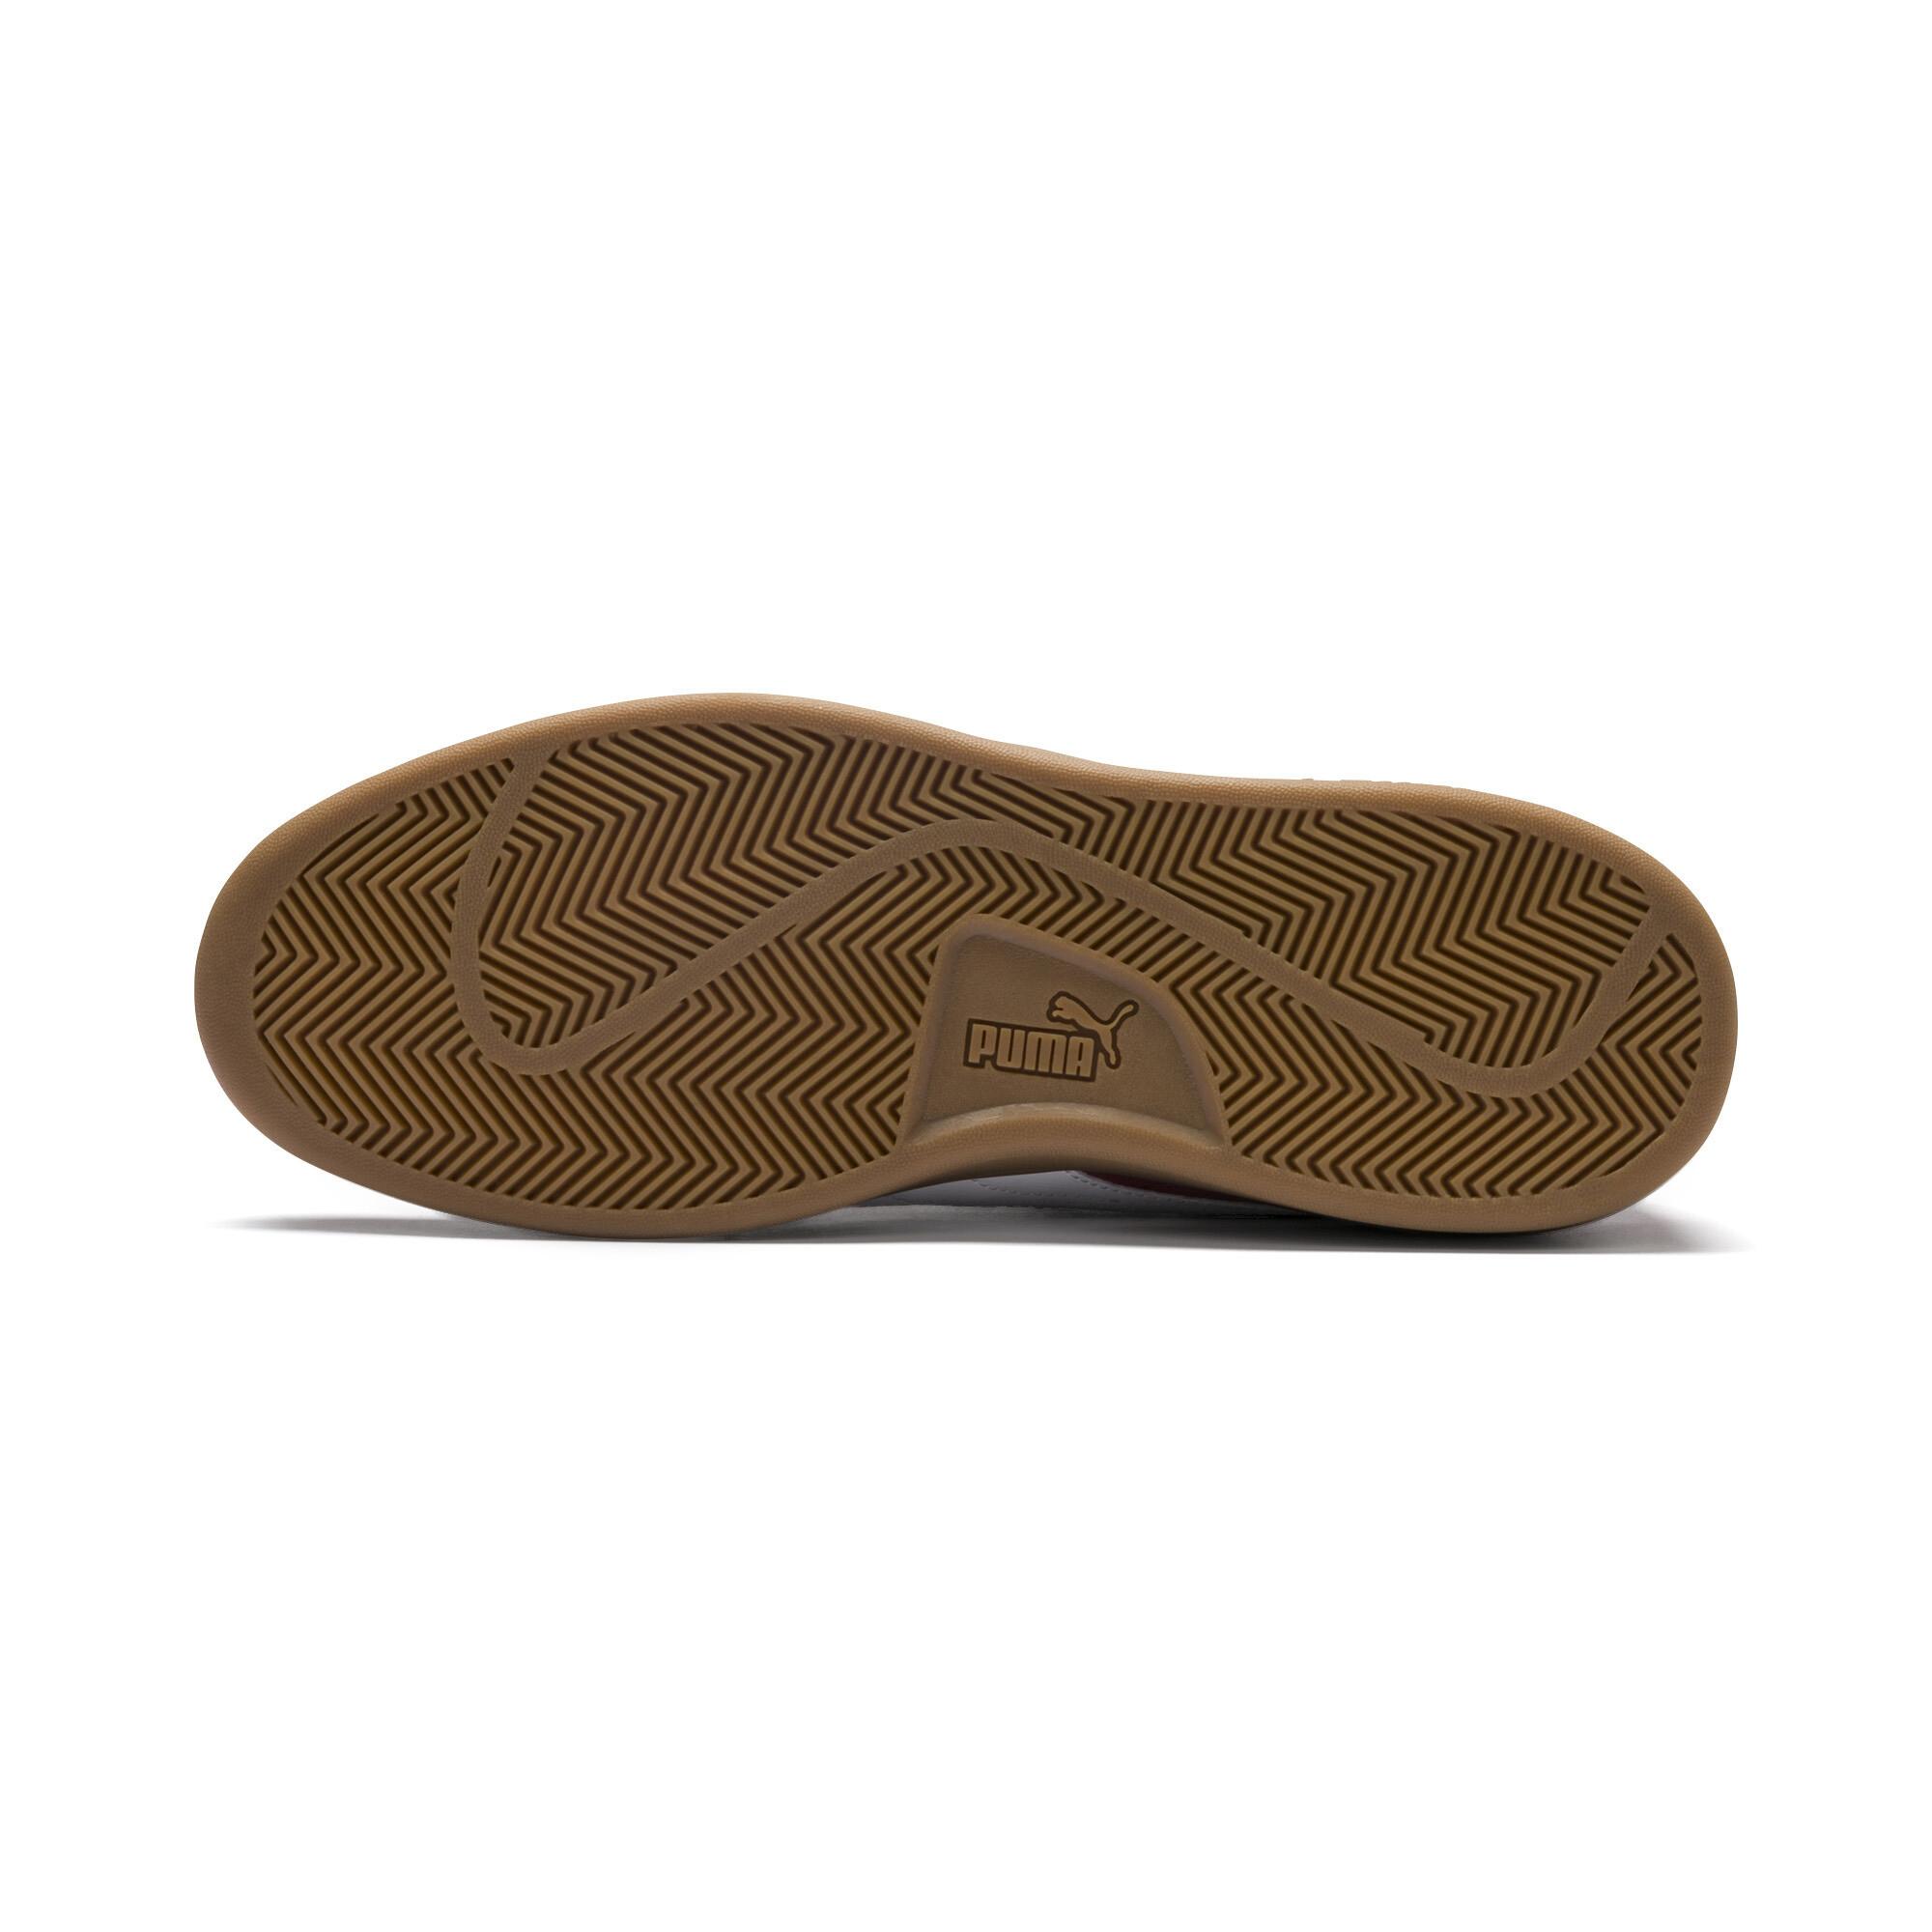 PUMA-Men-039-s-Astro-Kick-Sneakers thumbnail 5